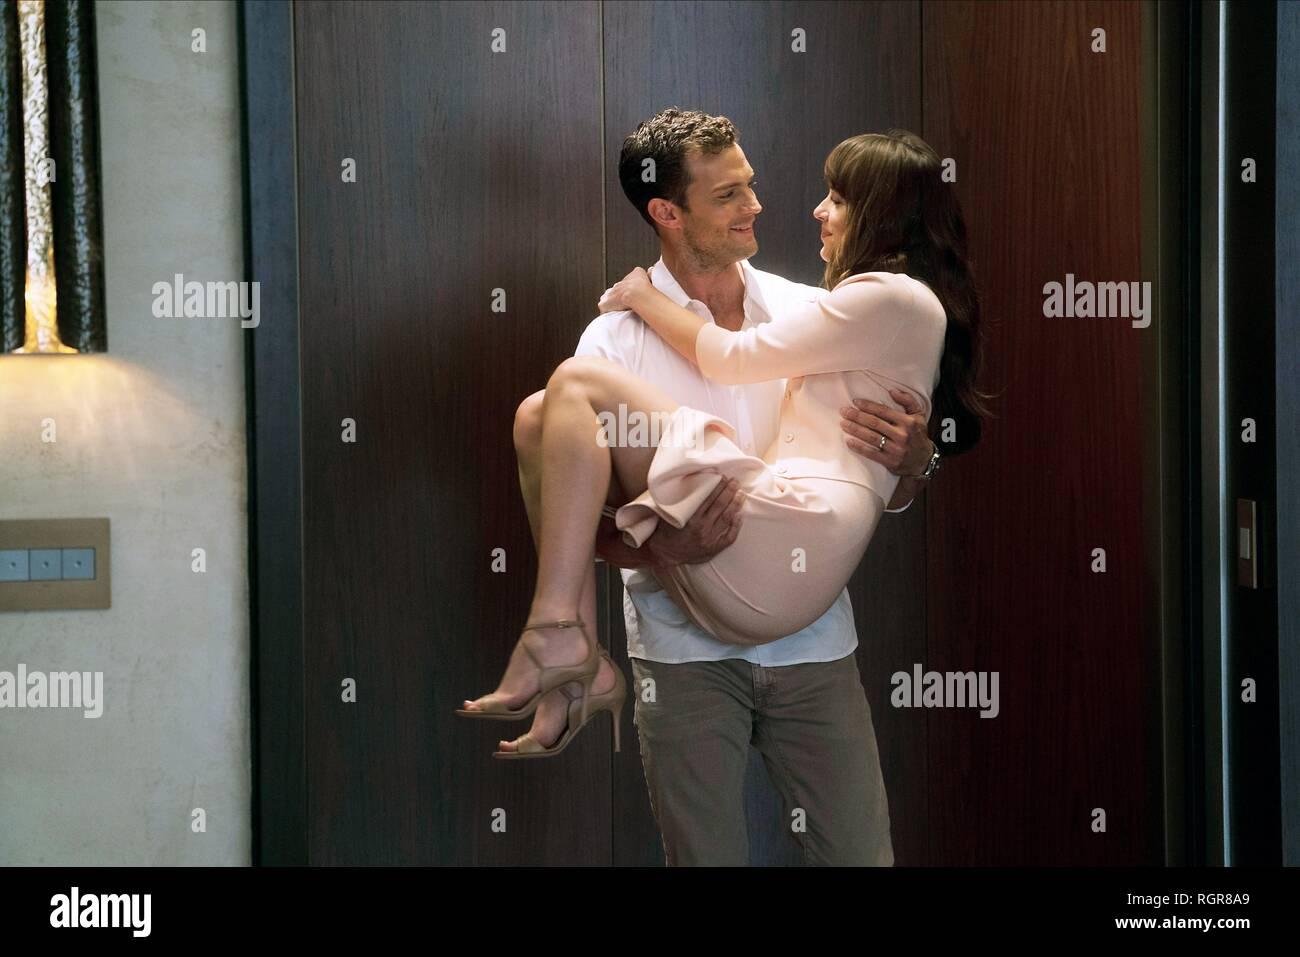 Jamie Dornan Dakota Johnson Fifty Shades Freed 2018 Stock Photo Alamy